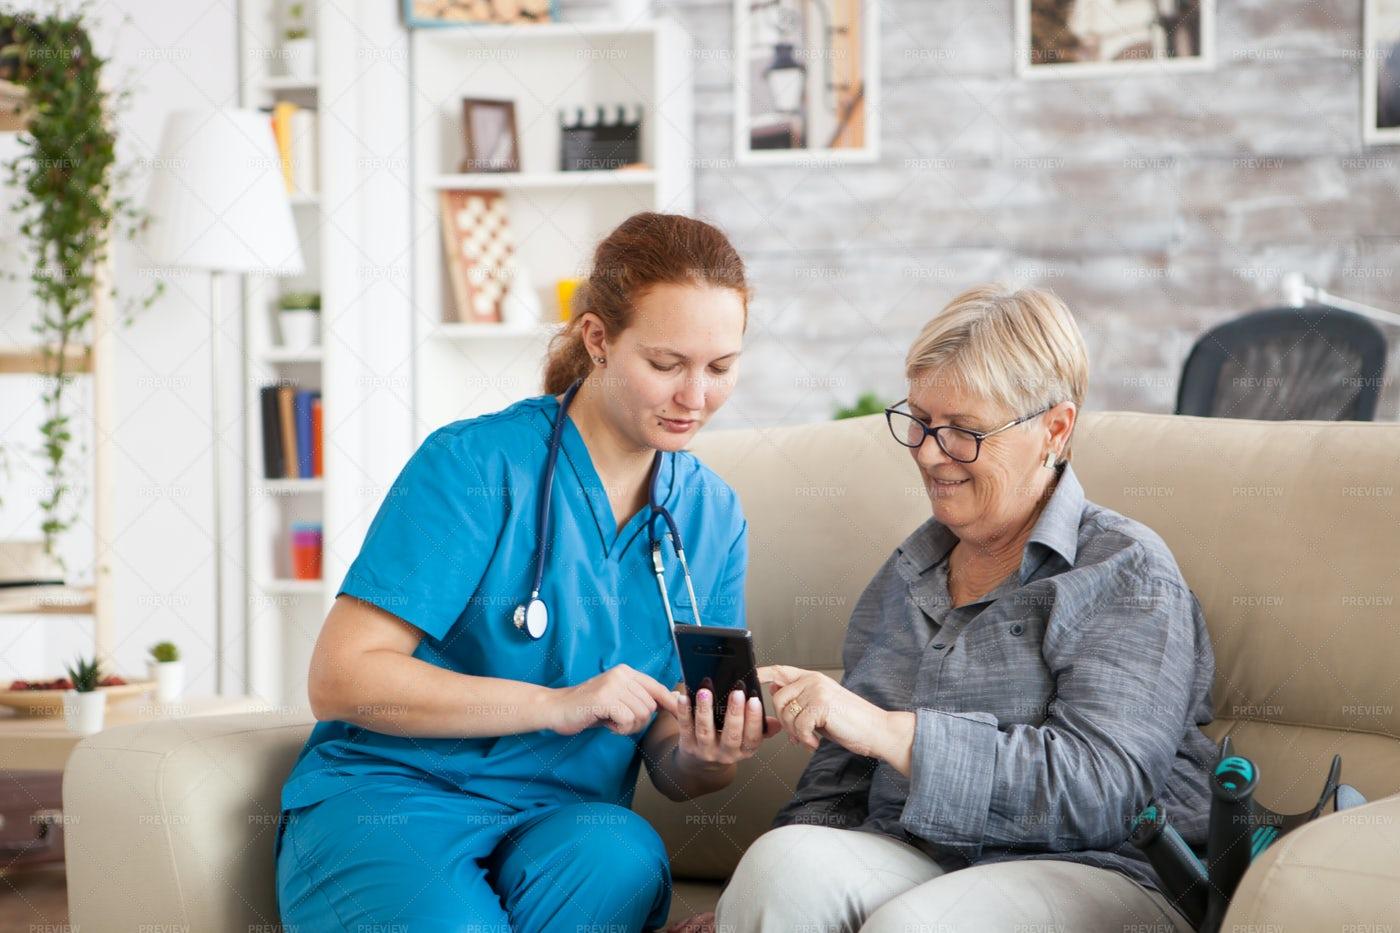 Nurse Helping Woman With App: Stock Photos